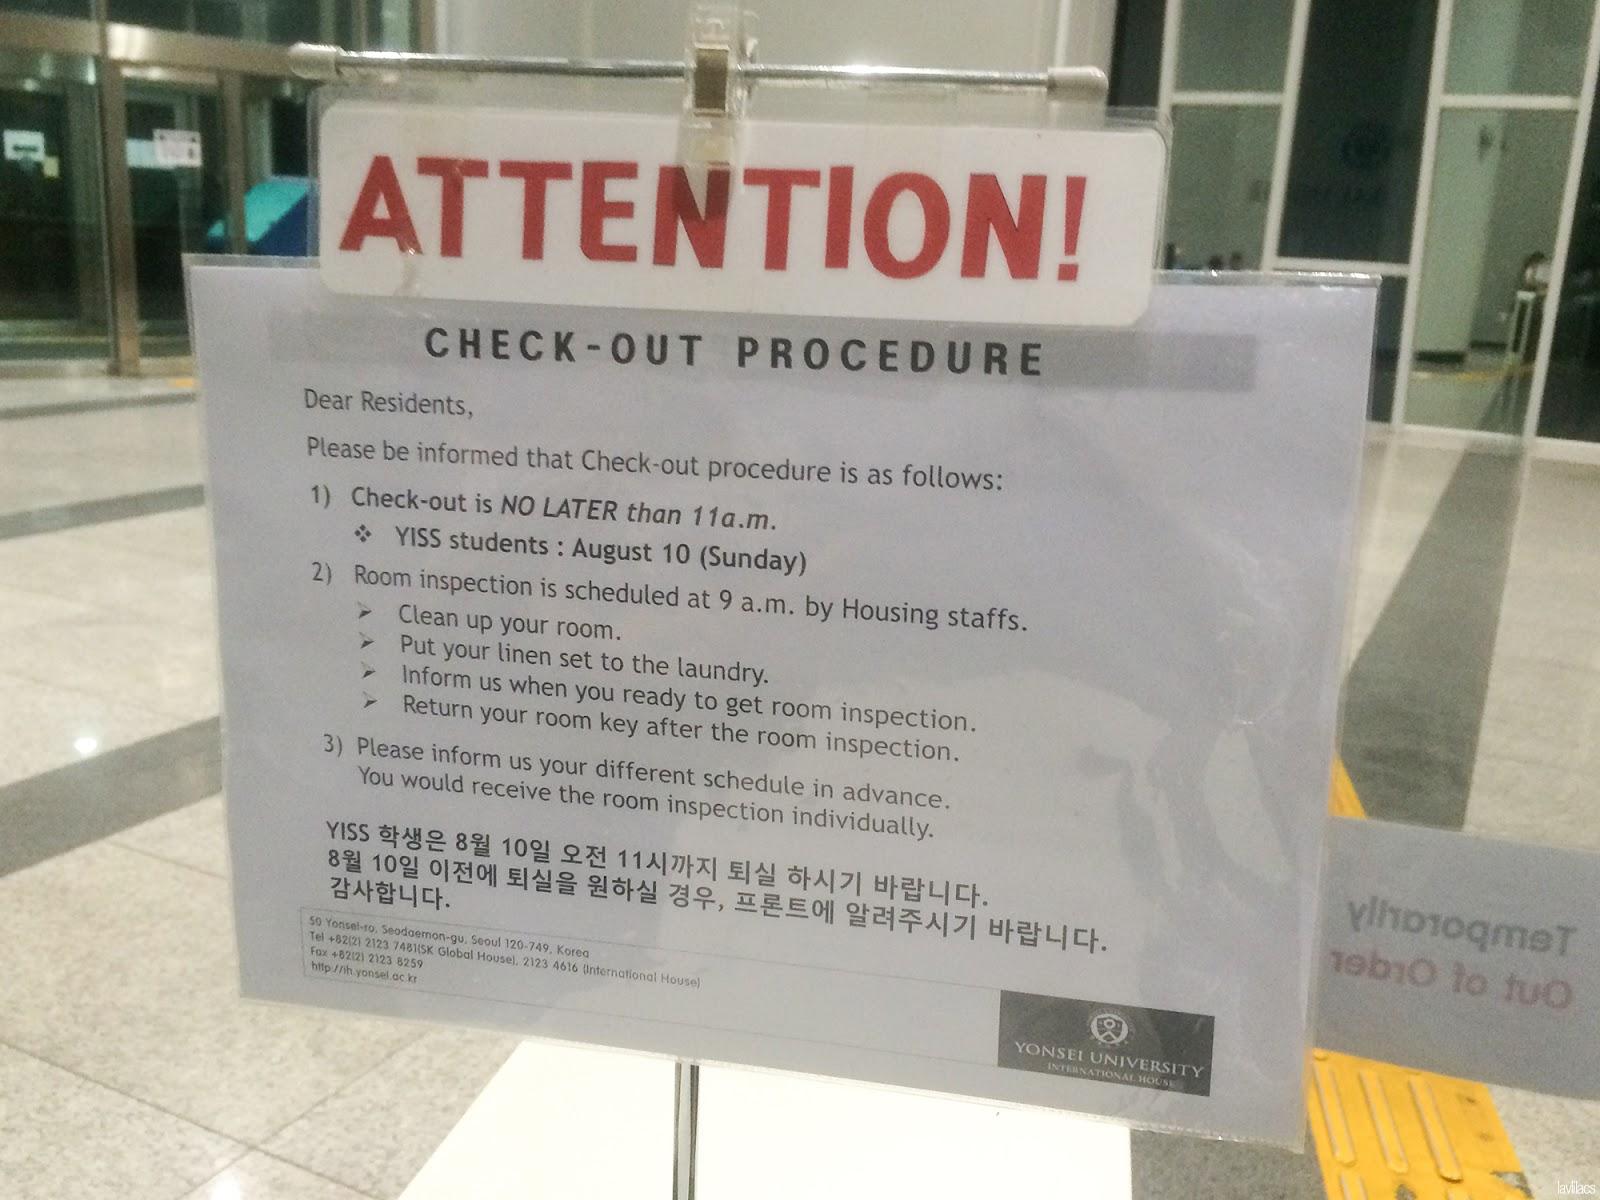 Seoul, Korea - Summer Study Abroad 2014 - Ending near - Checkout procedure at SK Global House